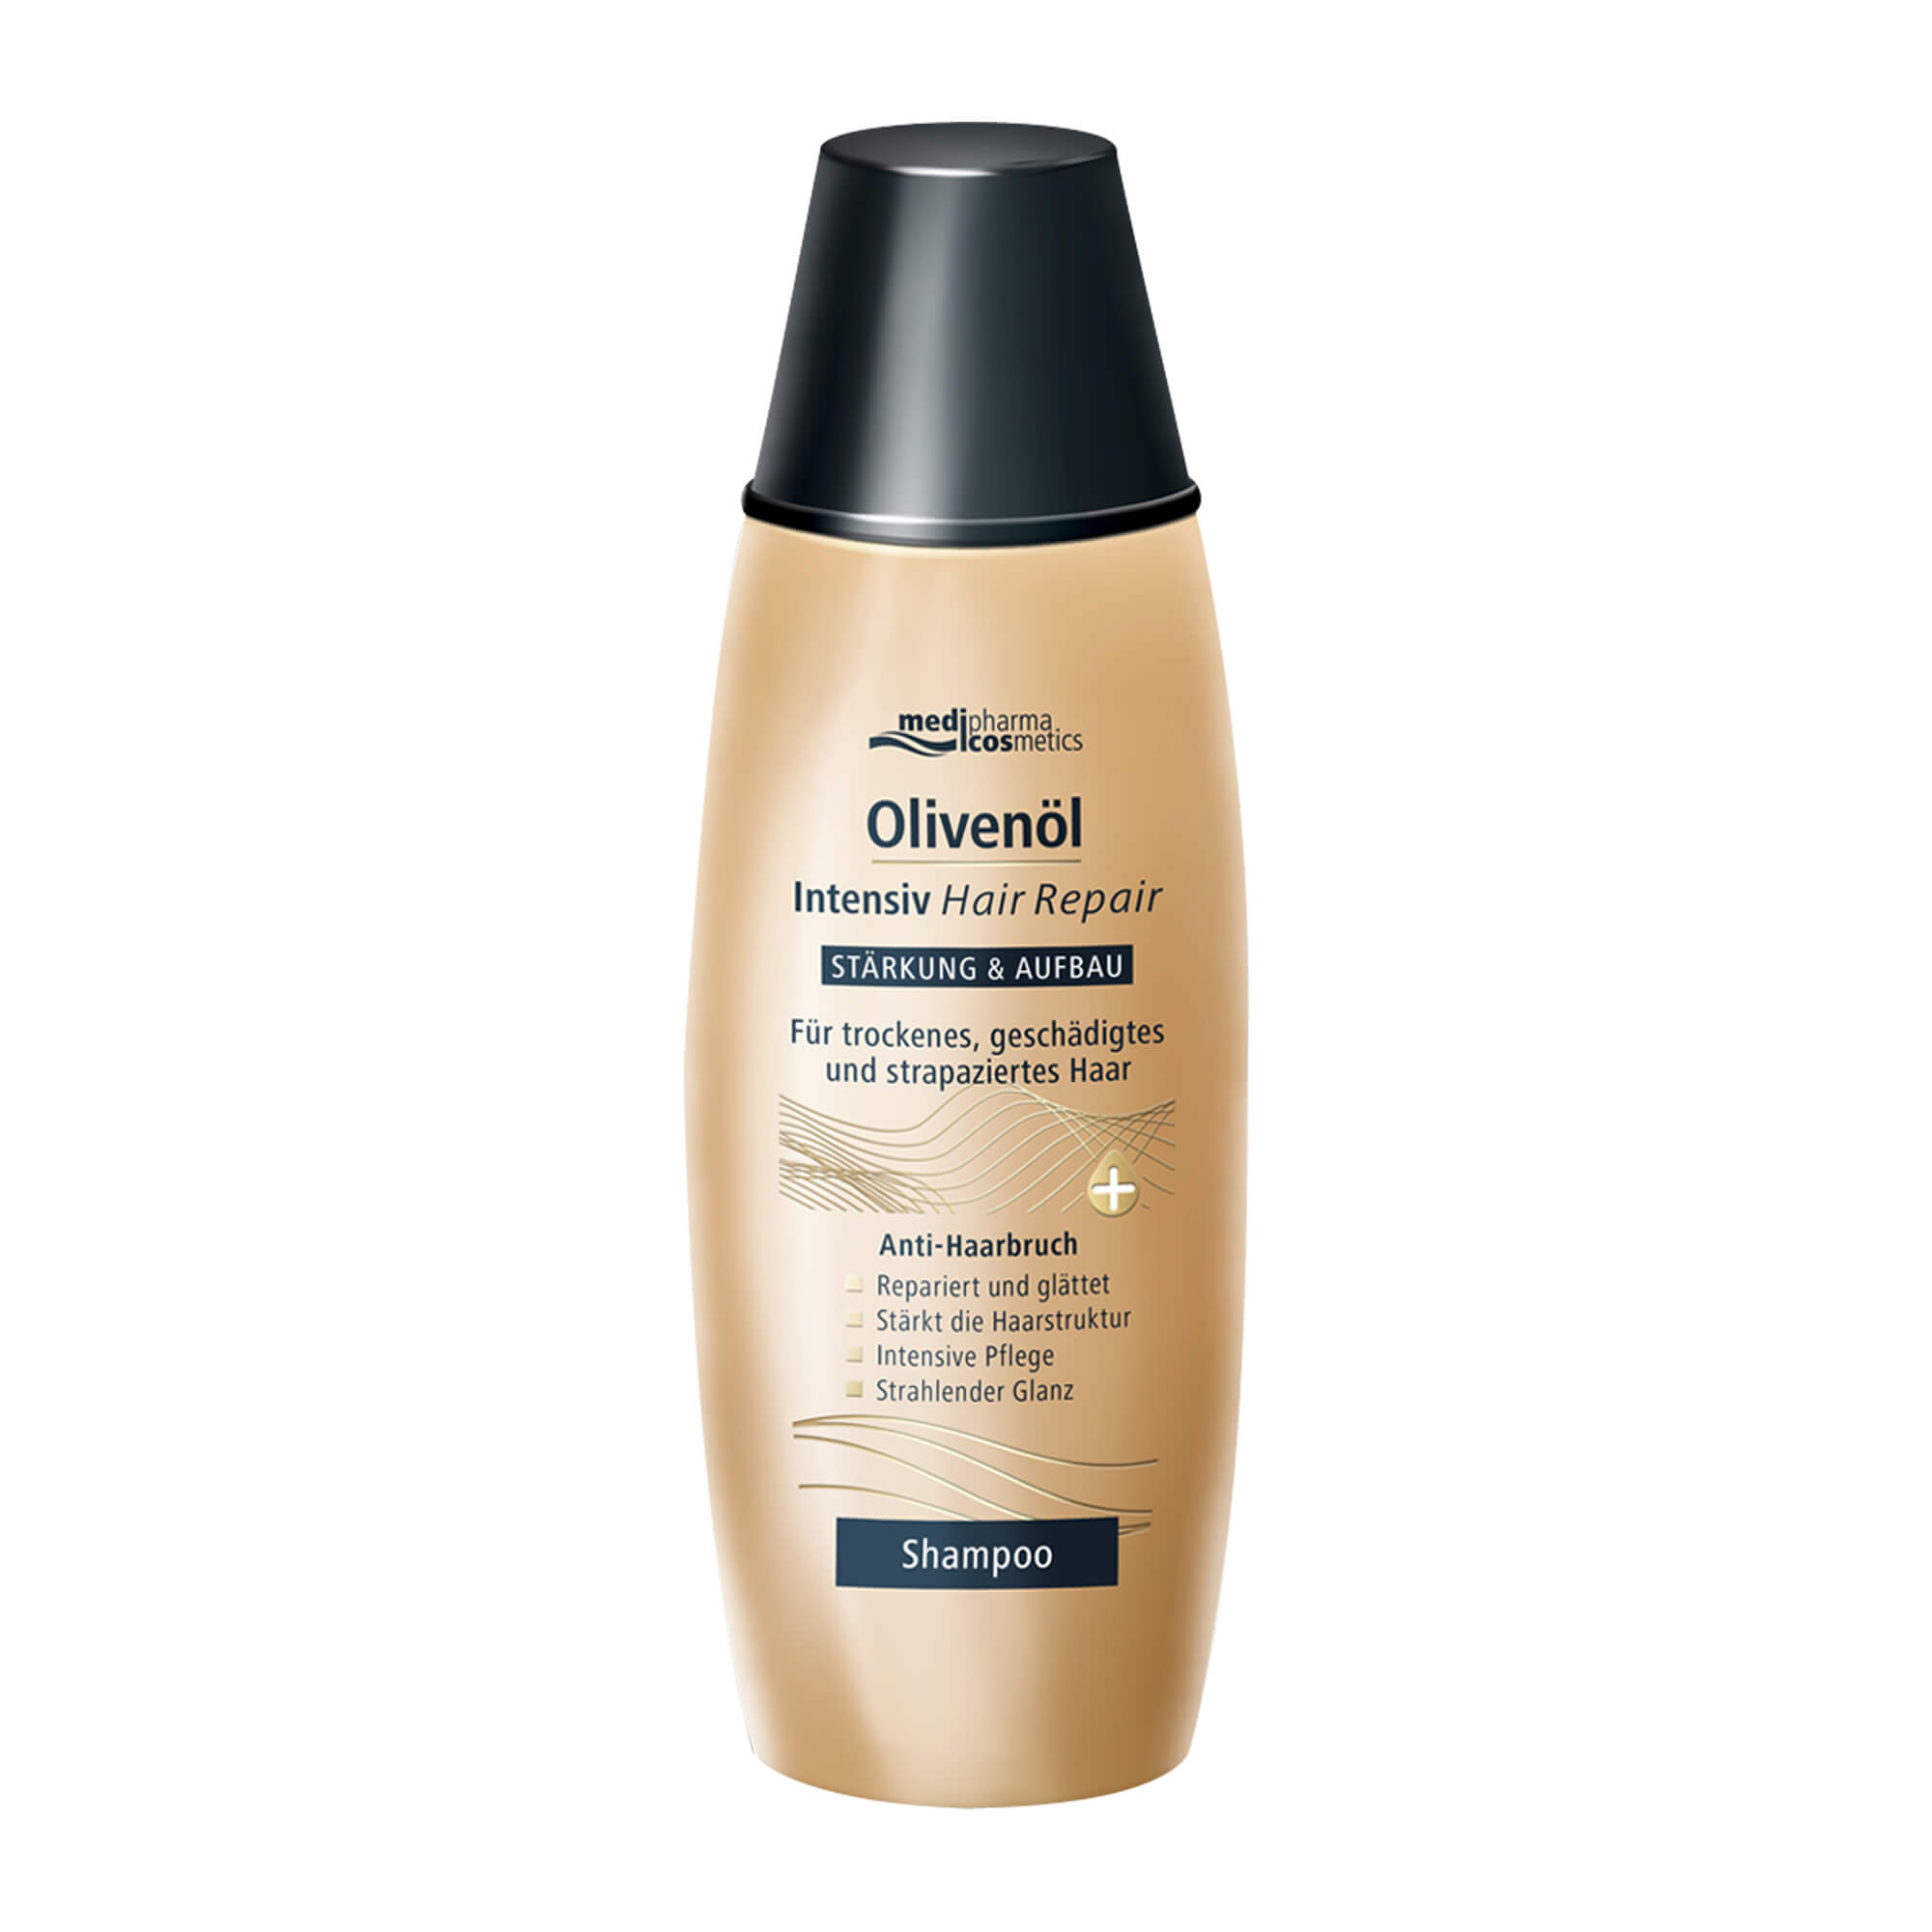 Olivenöl Intensiv Hair Repair Shampoo